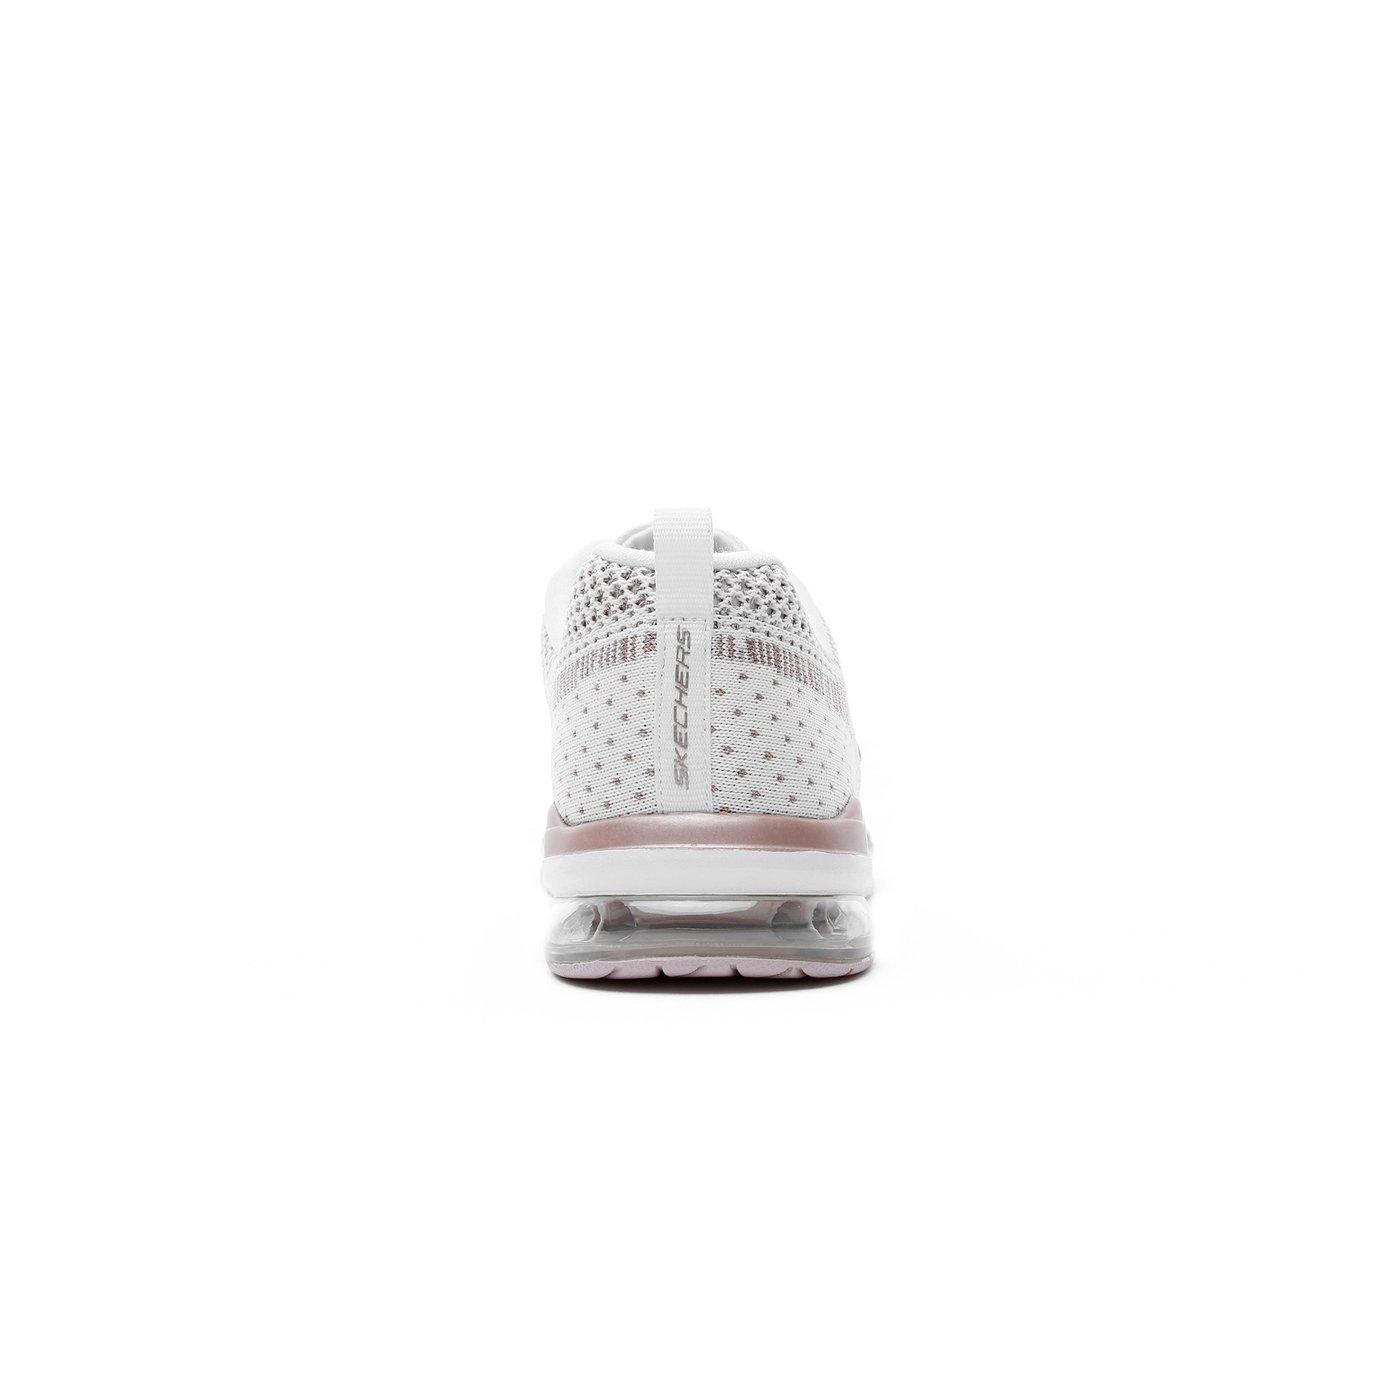 Skechers Skech- Air İnfinity-Stand Out Kadın Bej Spor Ayakkabı